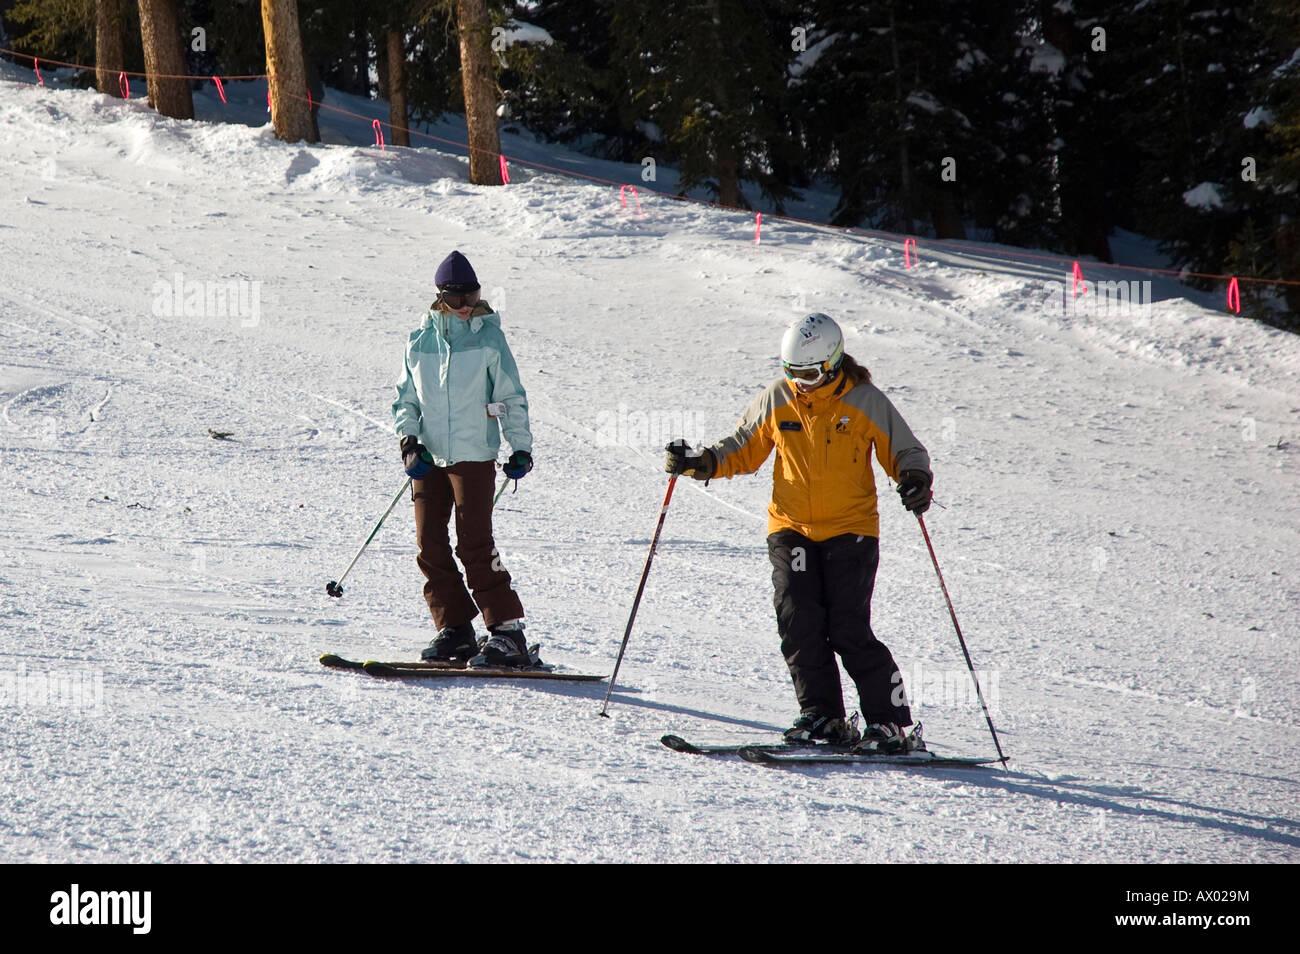 Student works with ski instructor, Arapahoe Basin Ski Area, Summit County, Colorado. - Stock Image